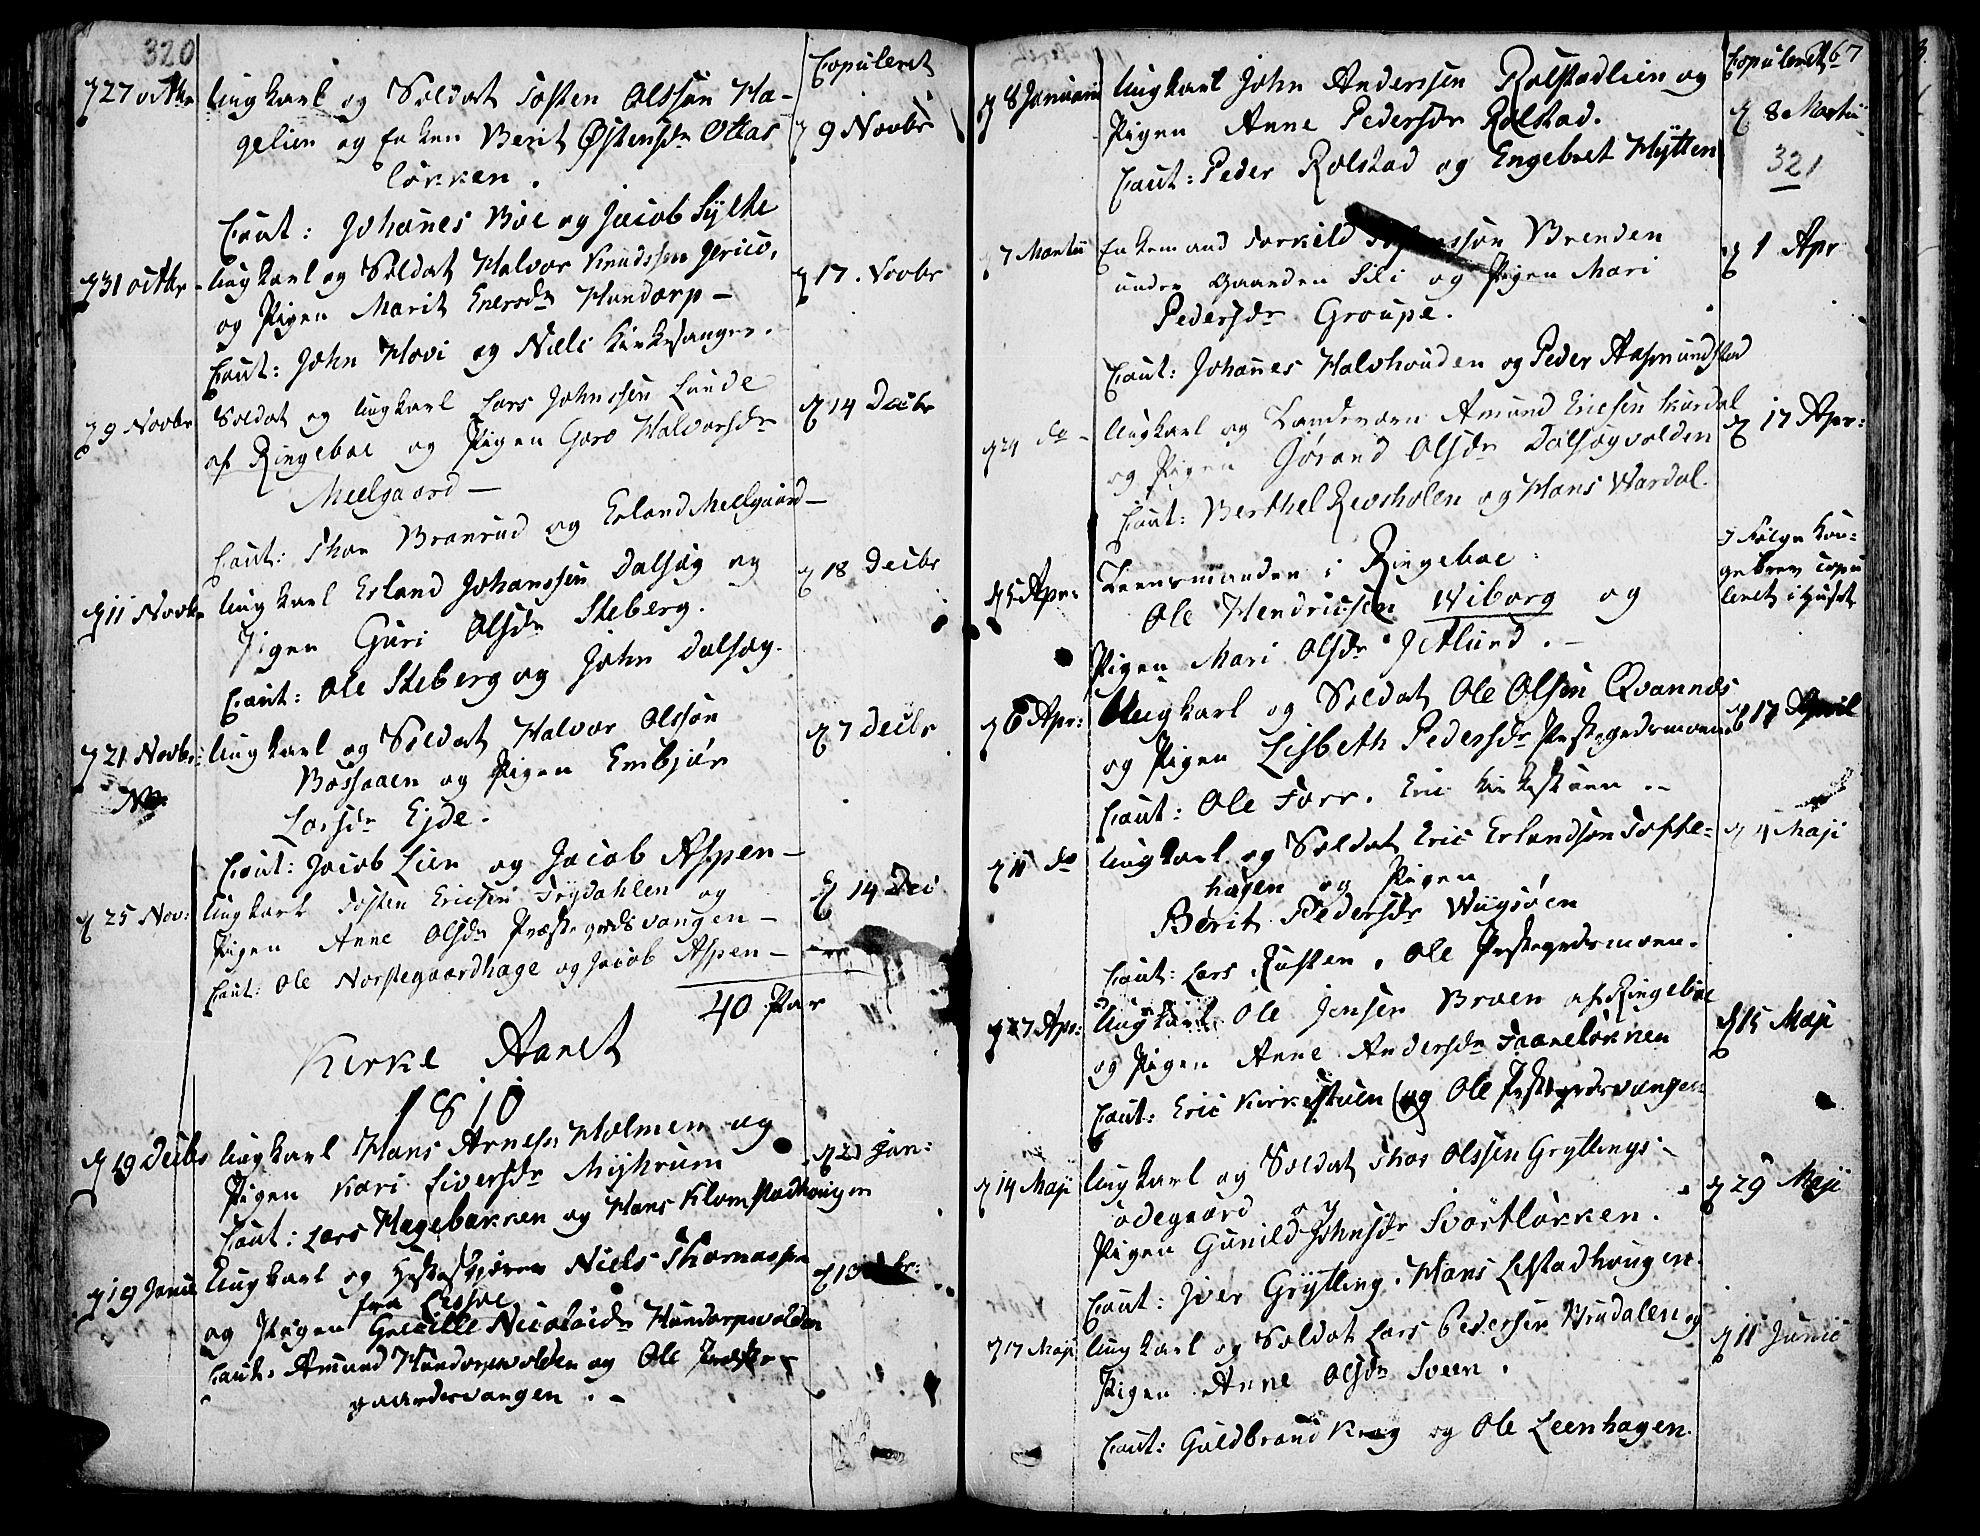 SAH, Fron prestekontor, H/Ha/Haa/L0001: Ministerialbok nr. 1, 1799-1816, s. 320-321